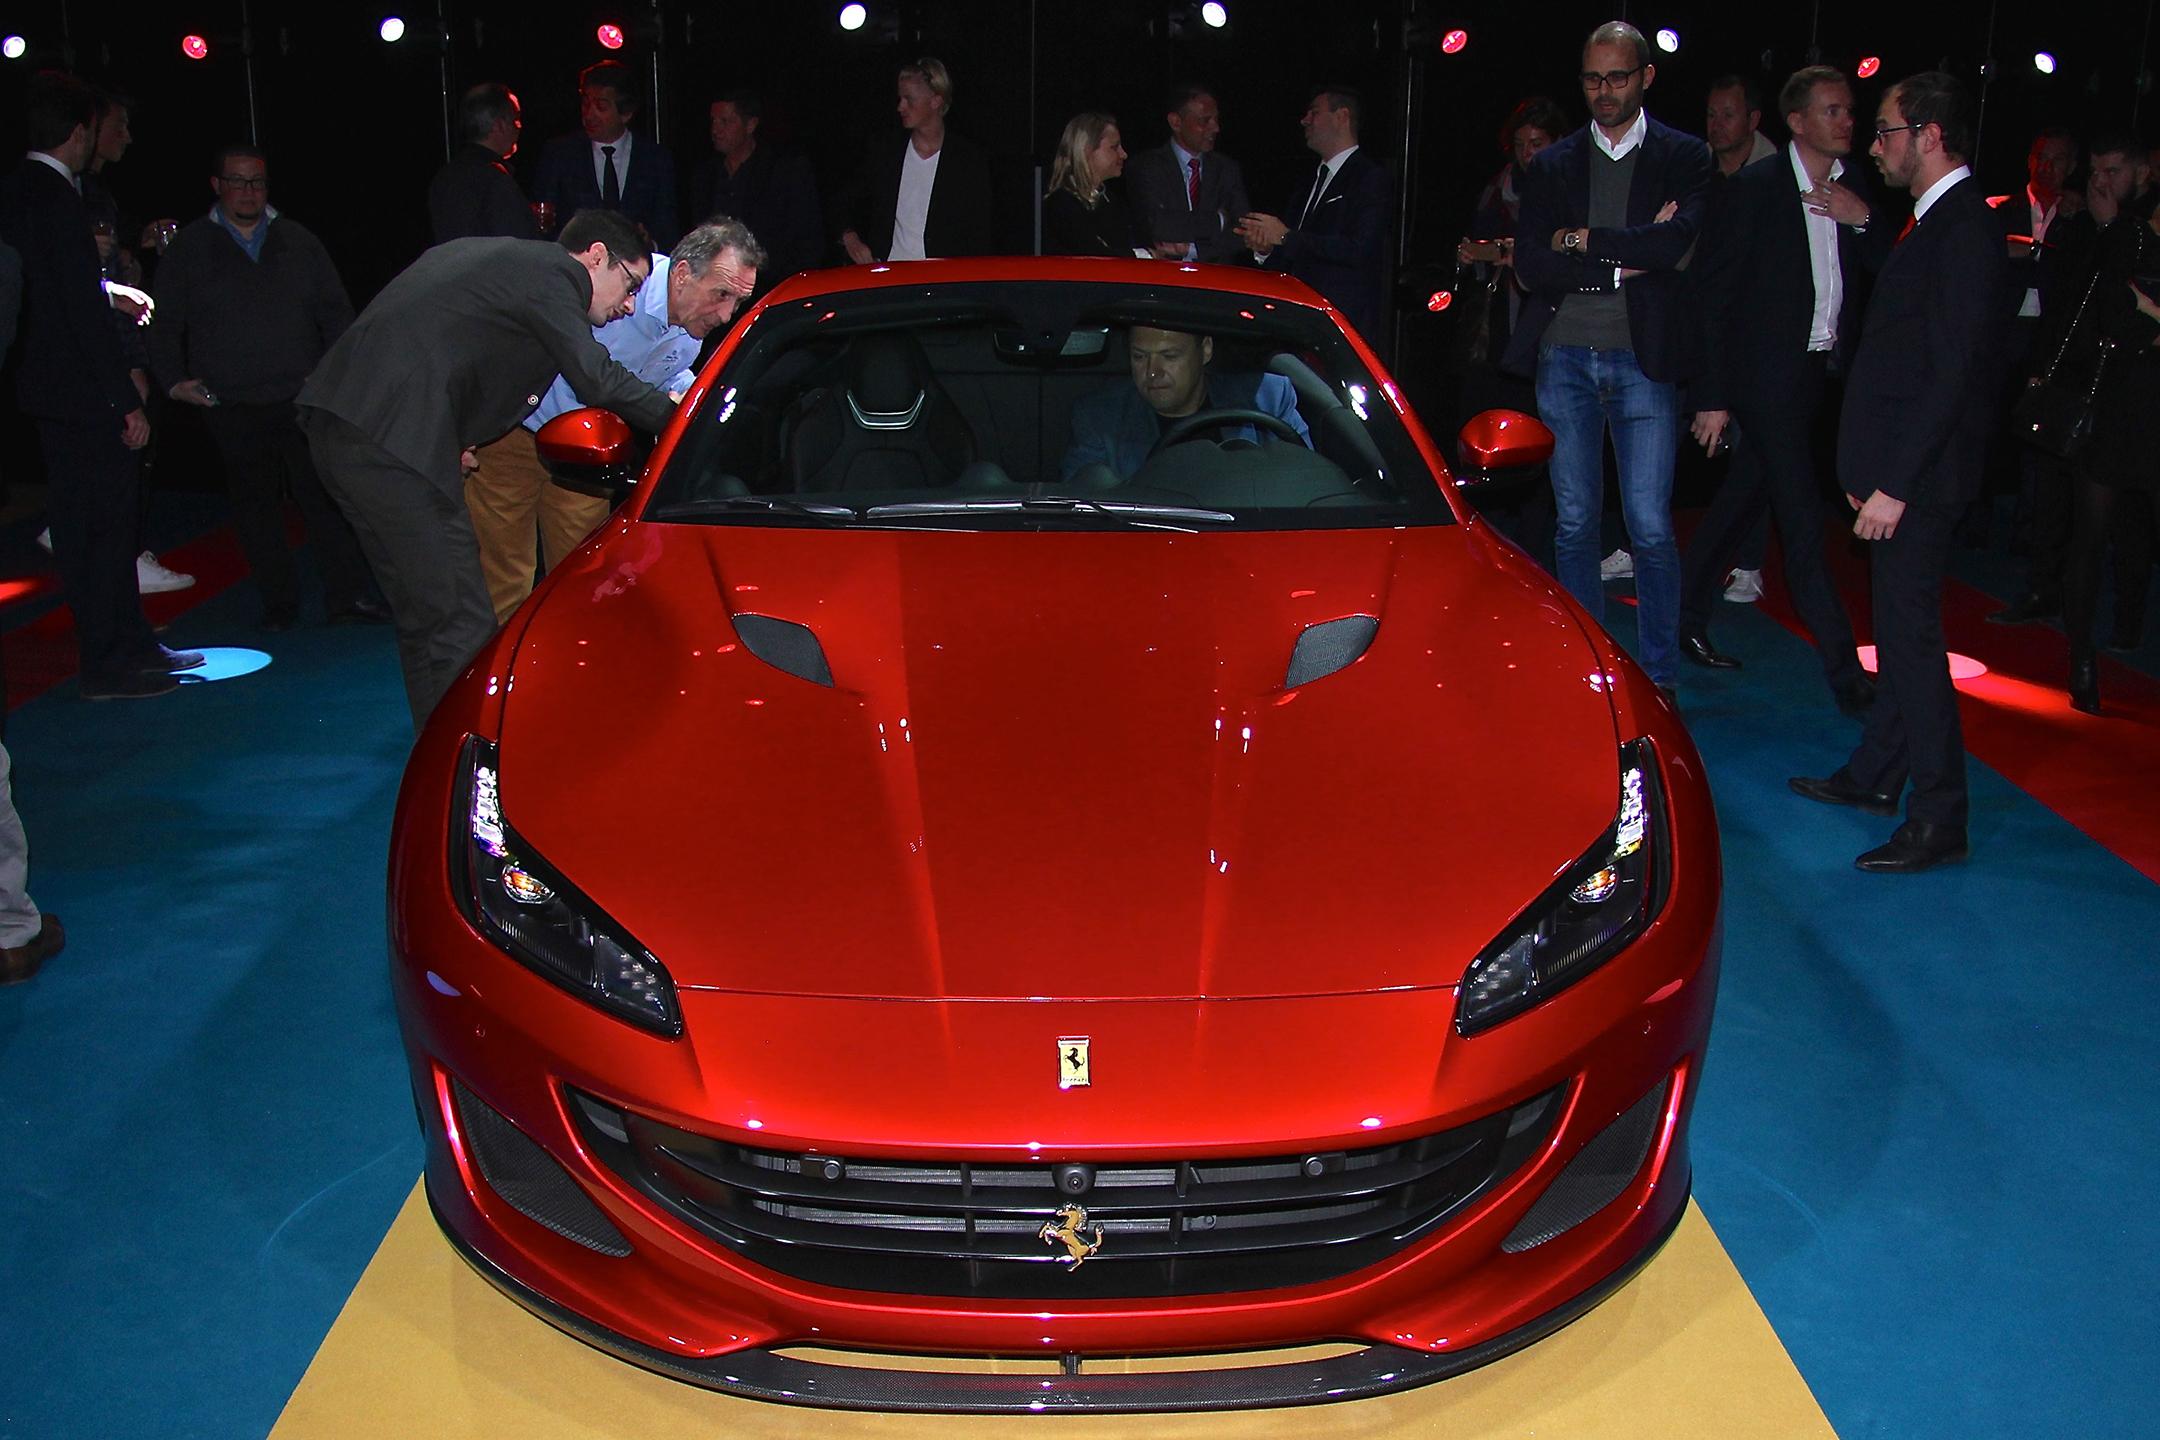 Ferrari Portofino - 2017 - top front / face avant - présentation Ferrari France - photo Ludo Ferrari